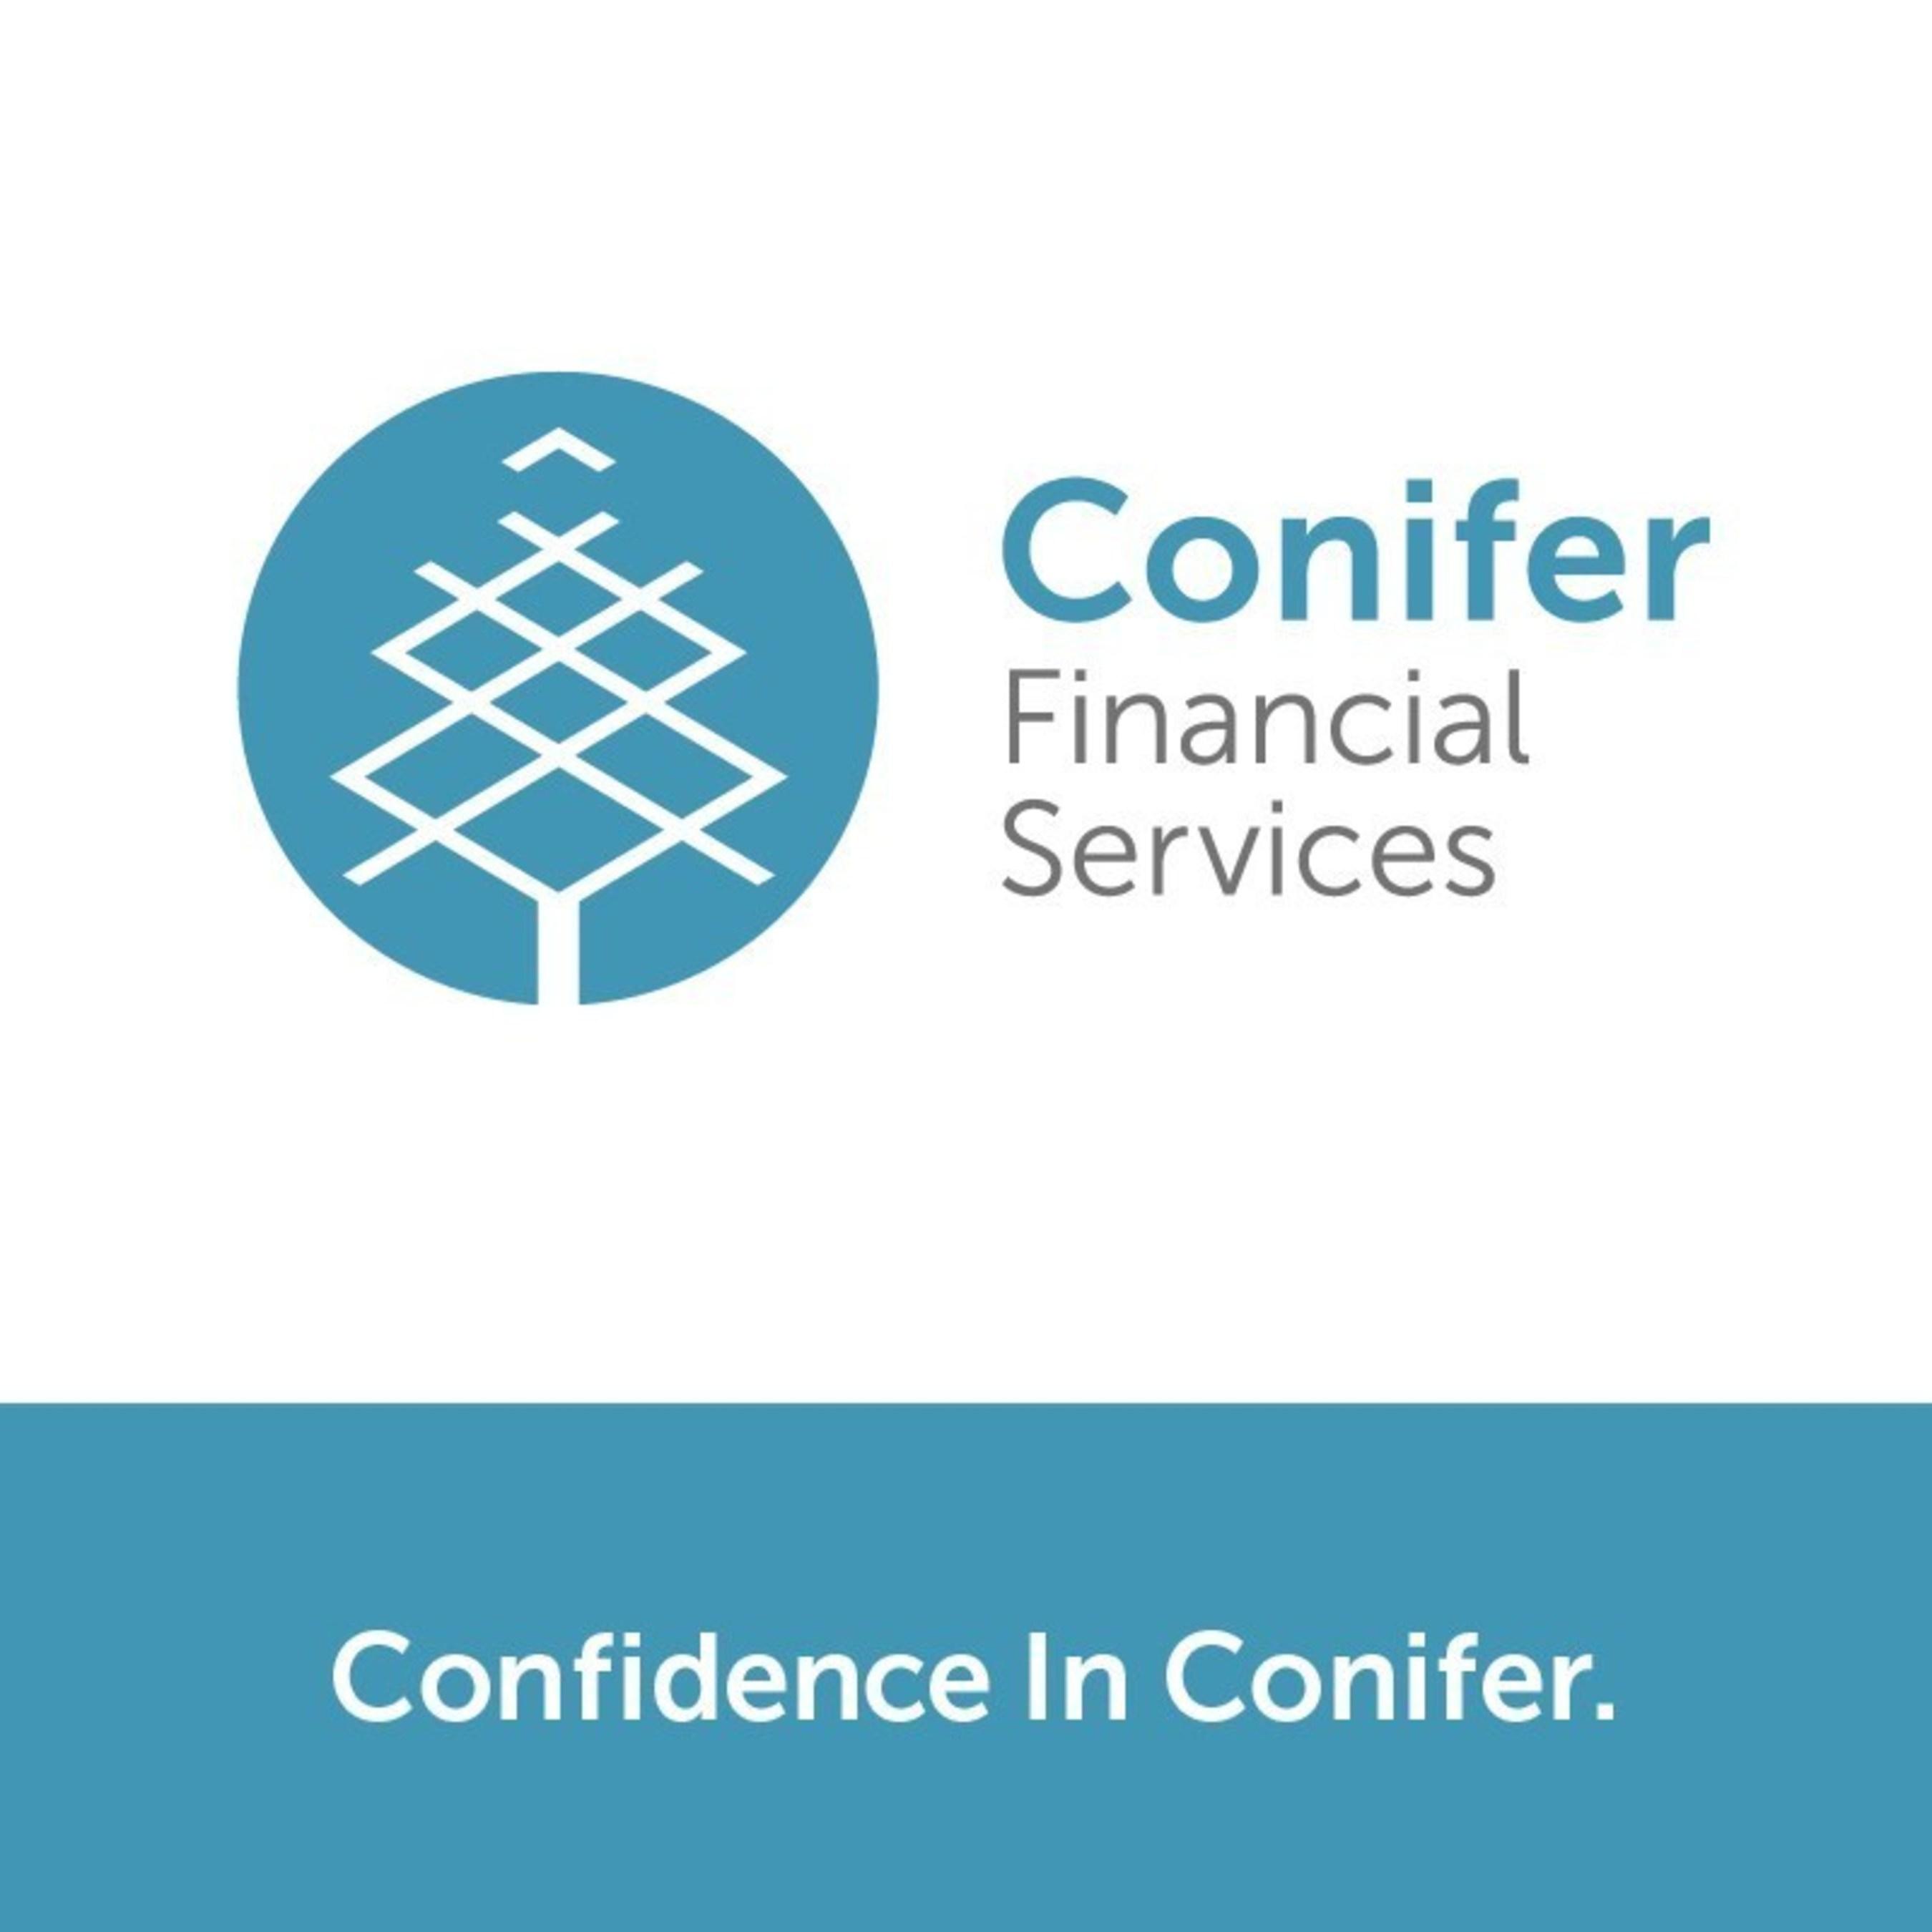 Conifer Financial Services (PRNewsFoto/Conifer Financial Services, LLC)